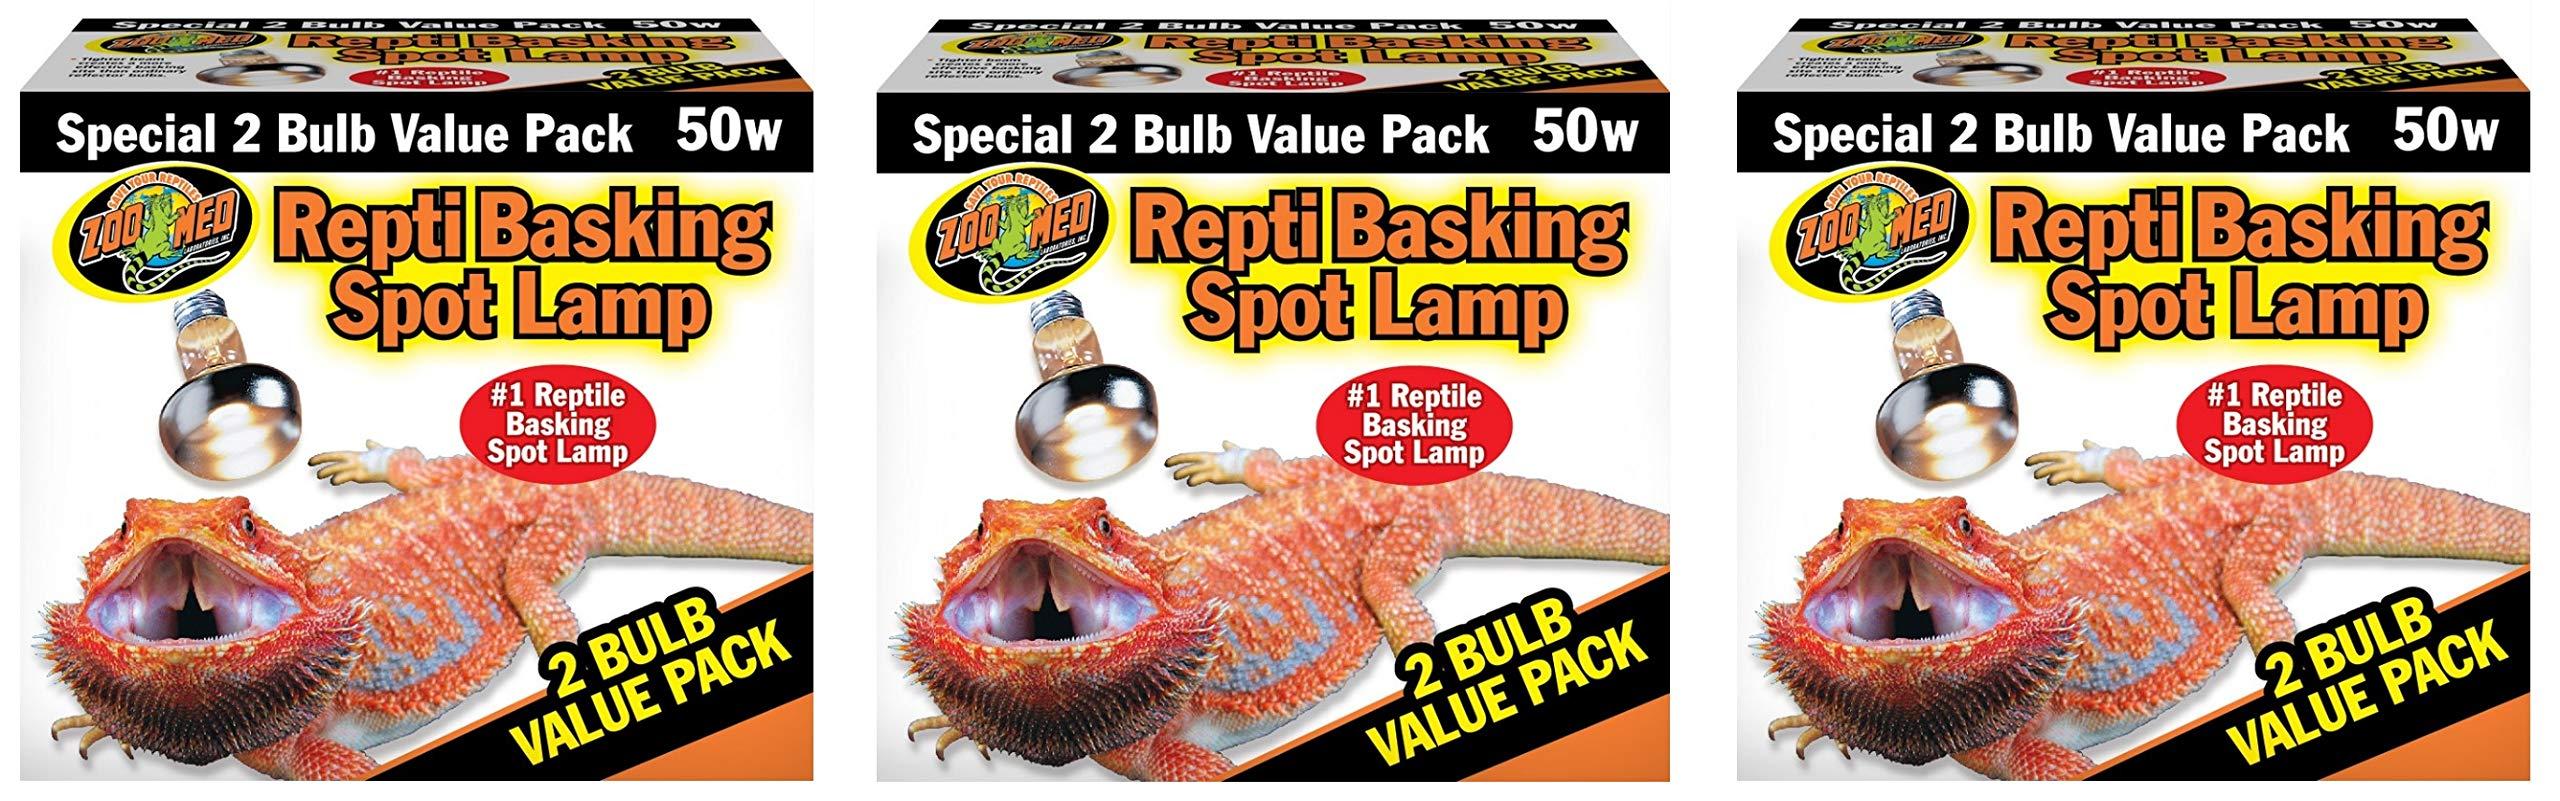 Zoo Med Reptile Basking Spot Lamp 50 Watt - 6 Bulbs Total (3 Packs with 2 per Pack) by Zoo Med